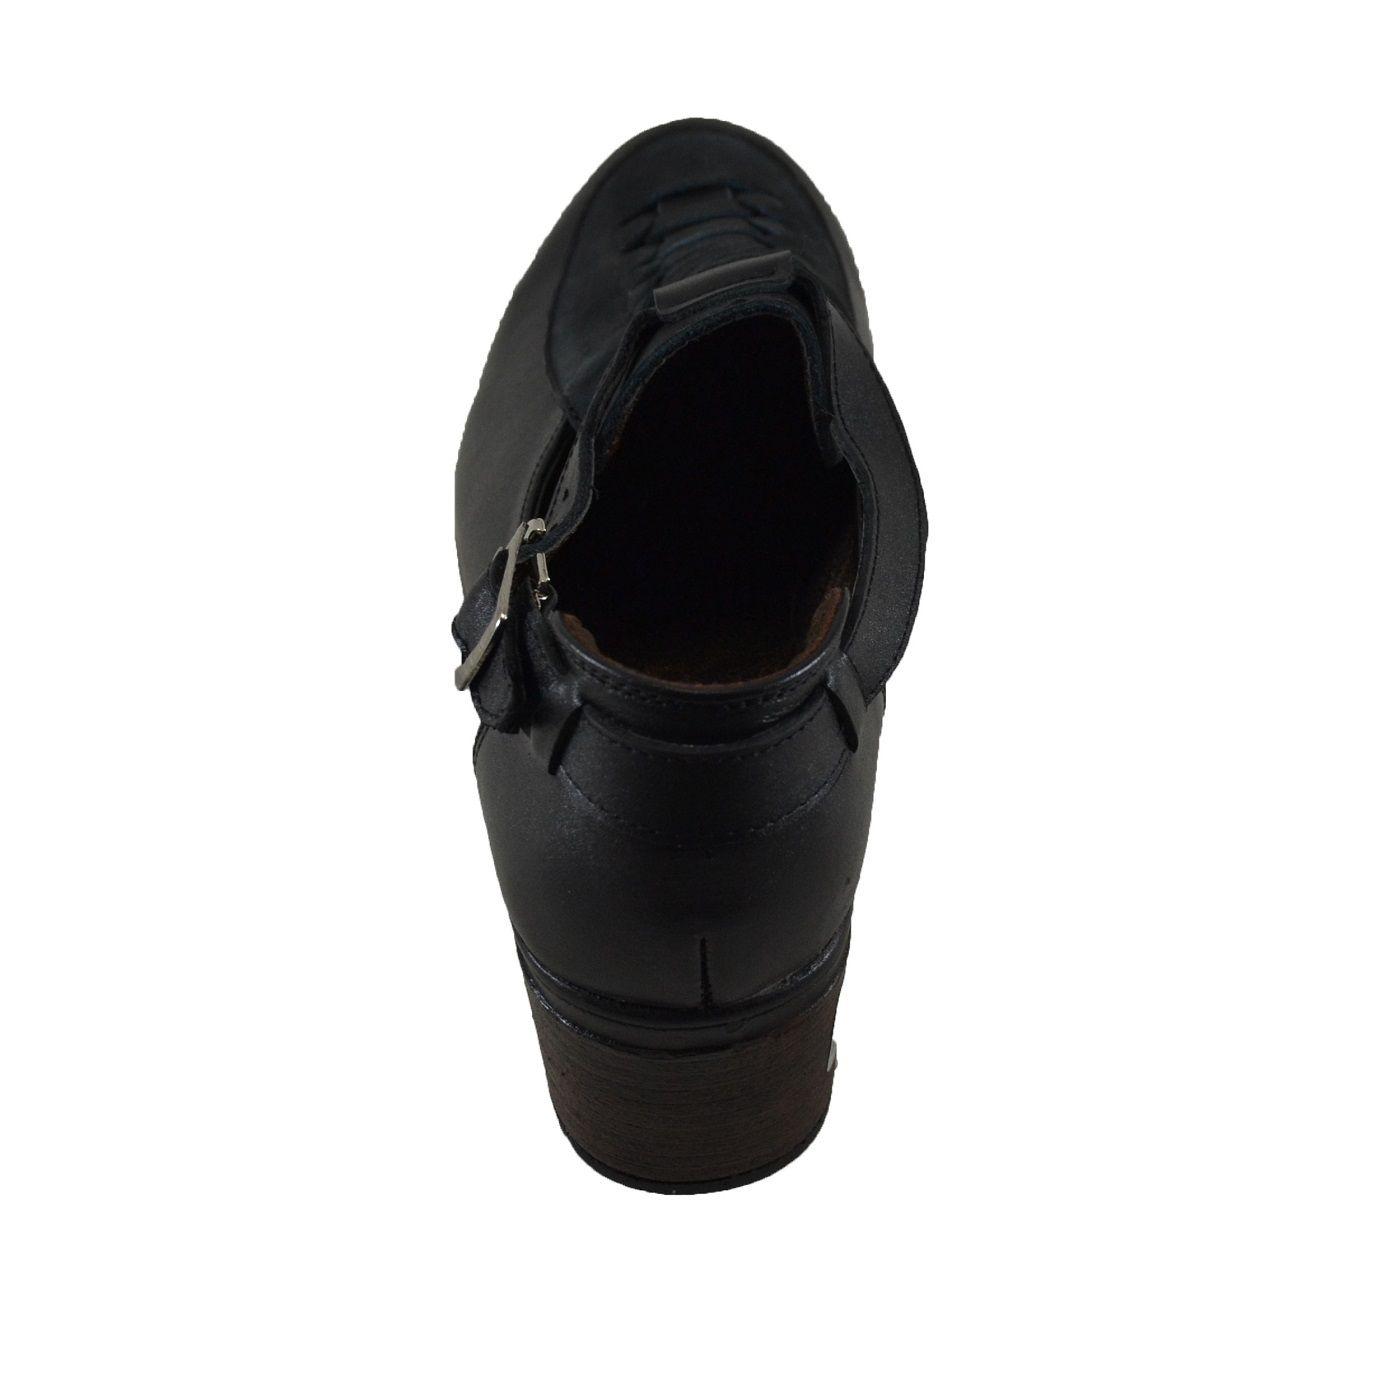 کفش زنانه کد 461 -  - 4